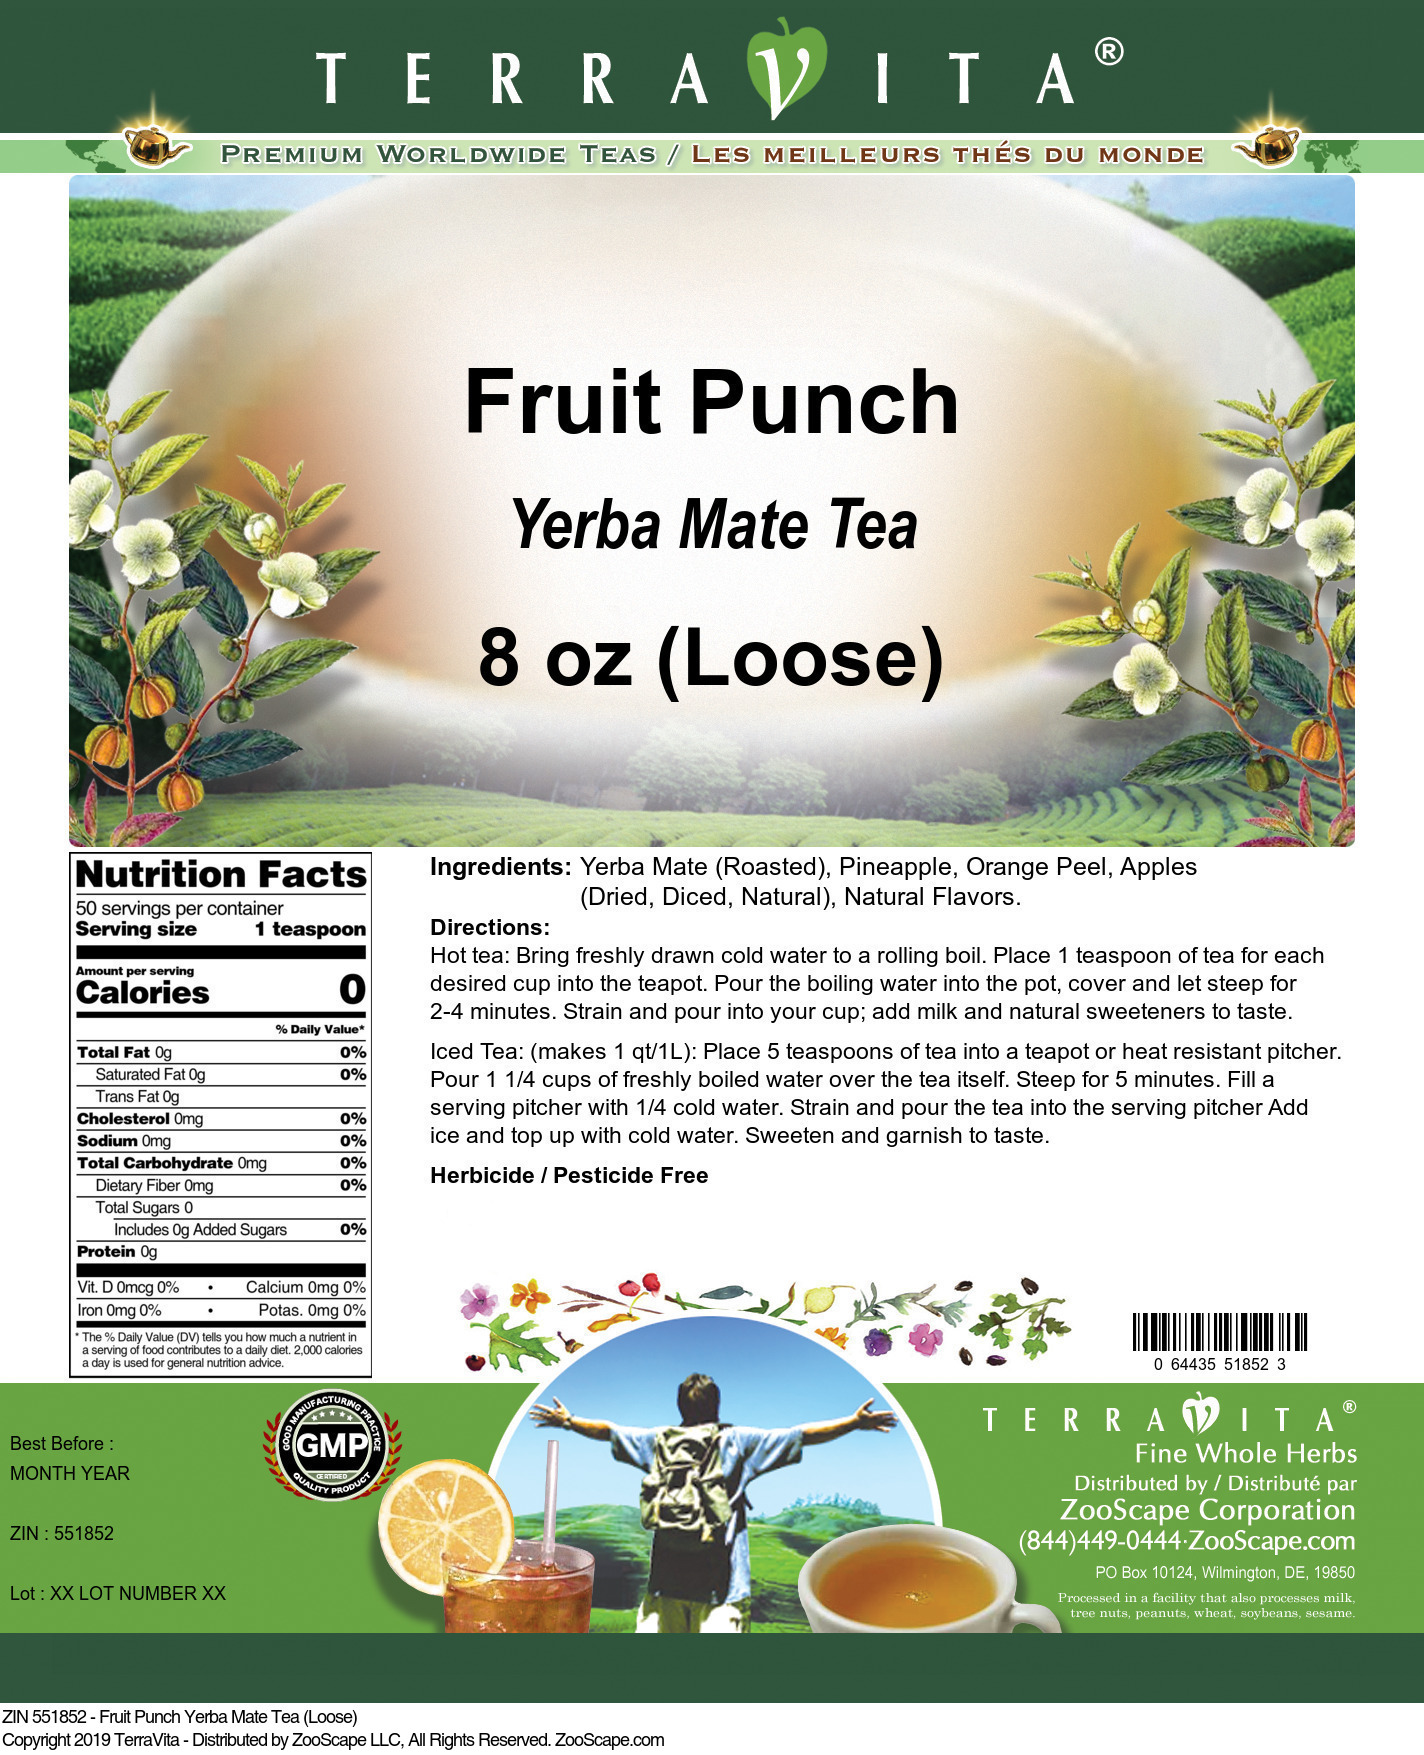 Fruit Punch Yerba Mate Tea (Loose)